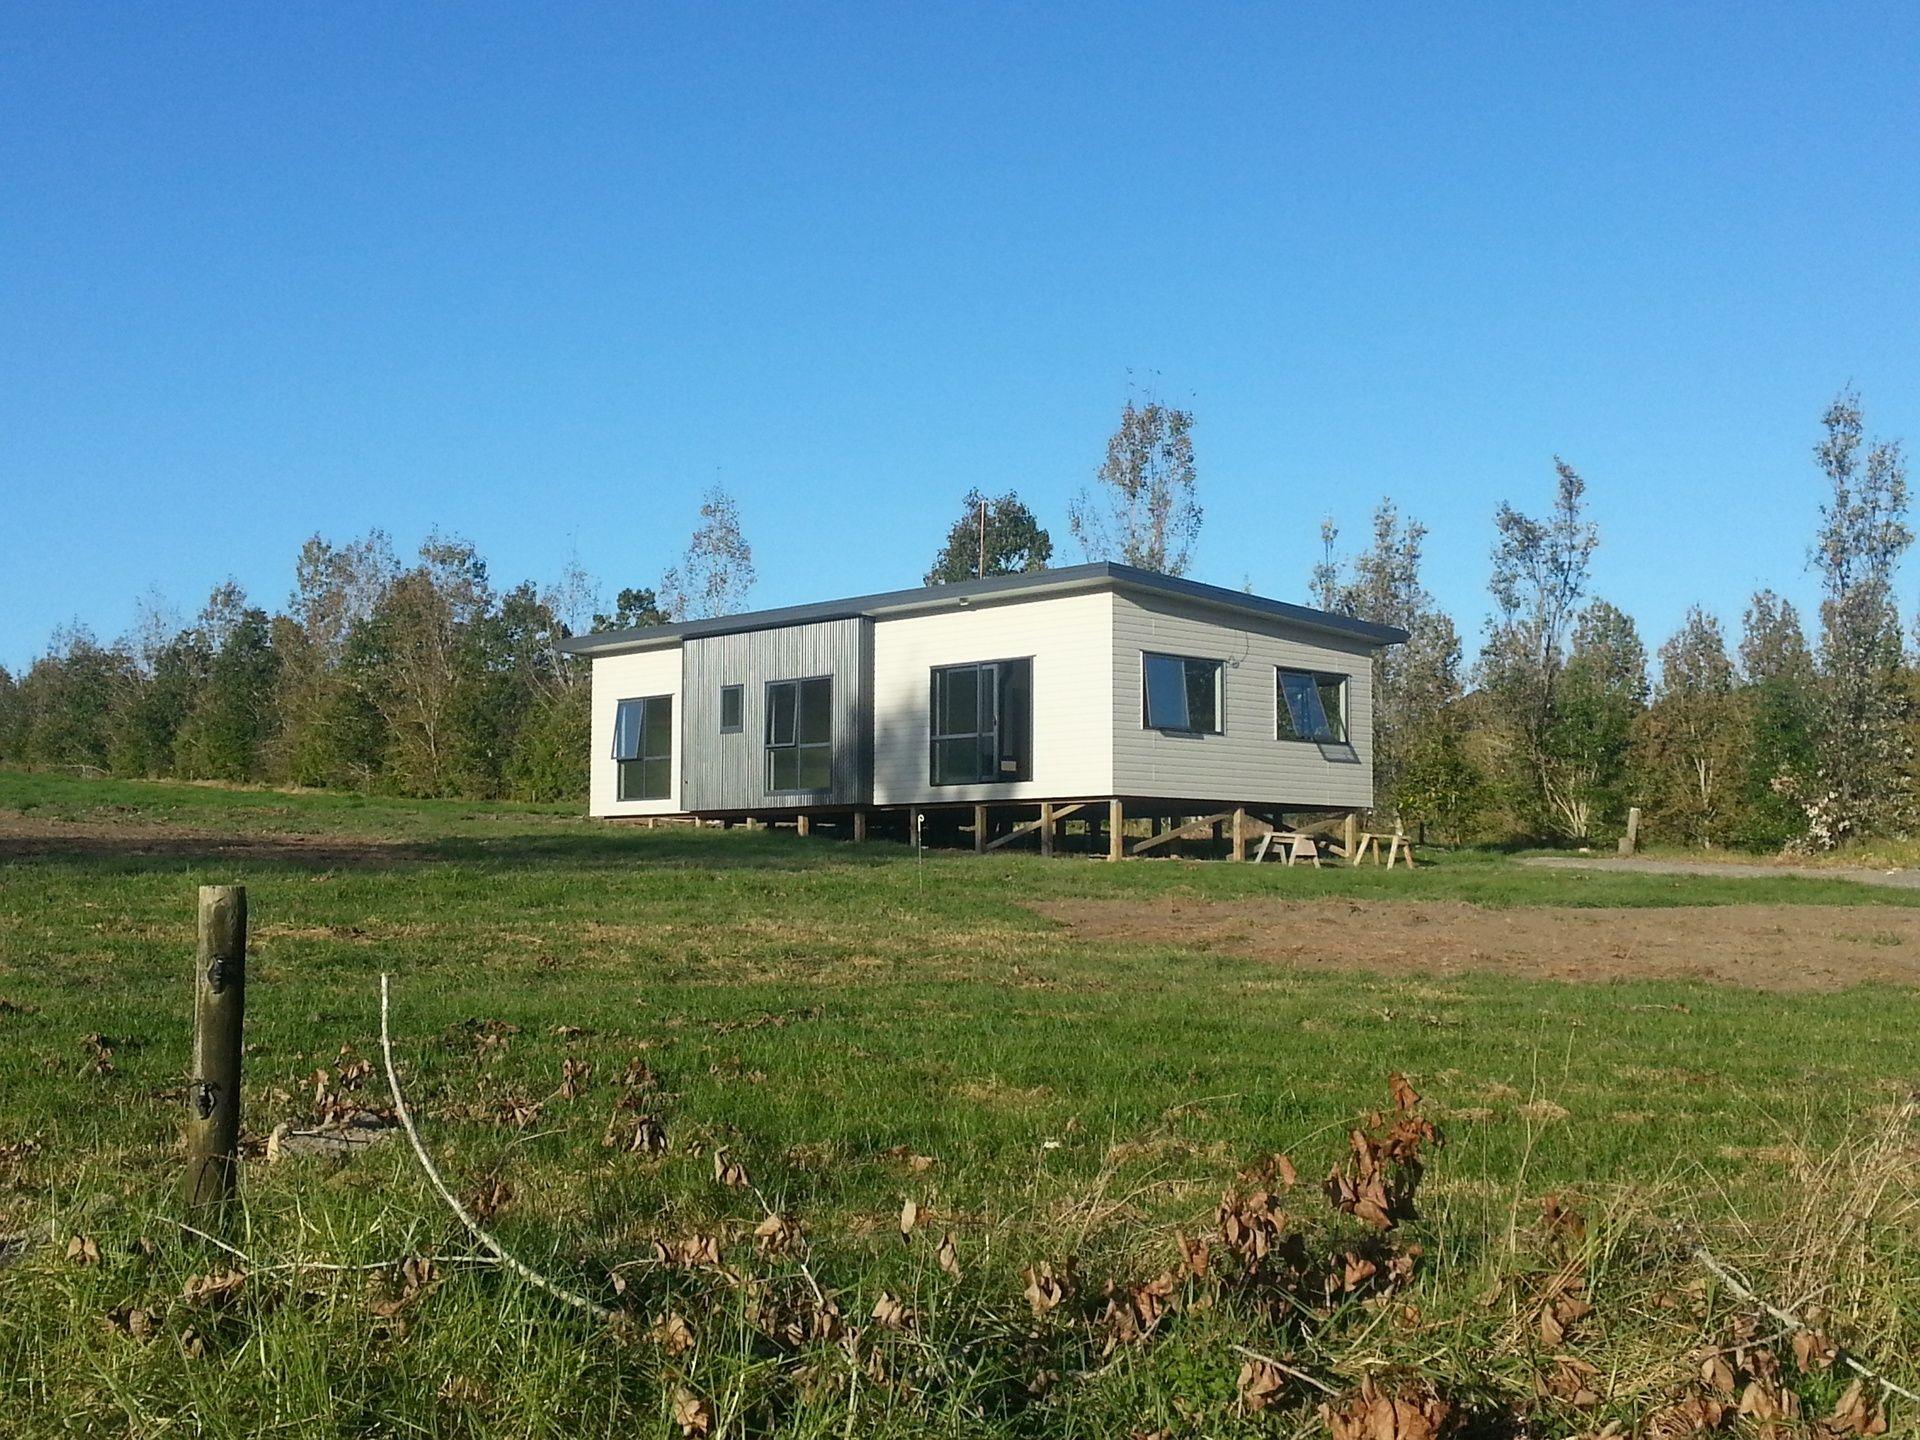 Transportable Homes Whangarei Builders Builder Show Home Whangarei